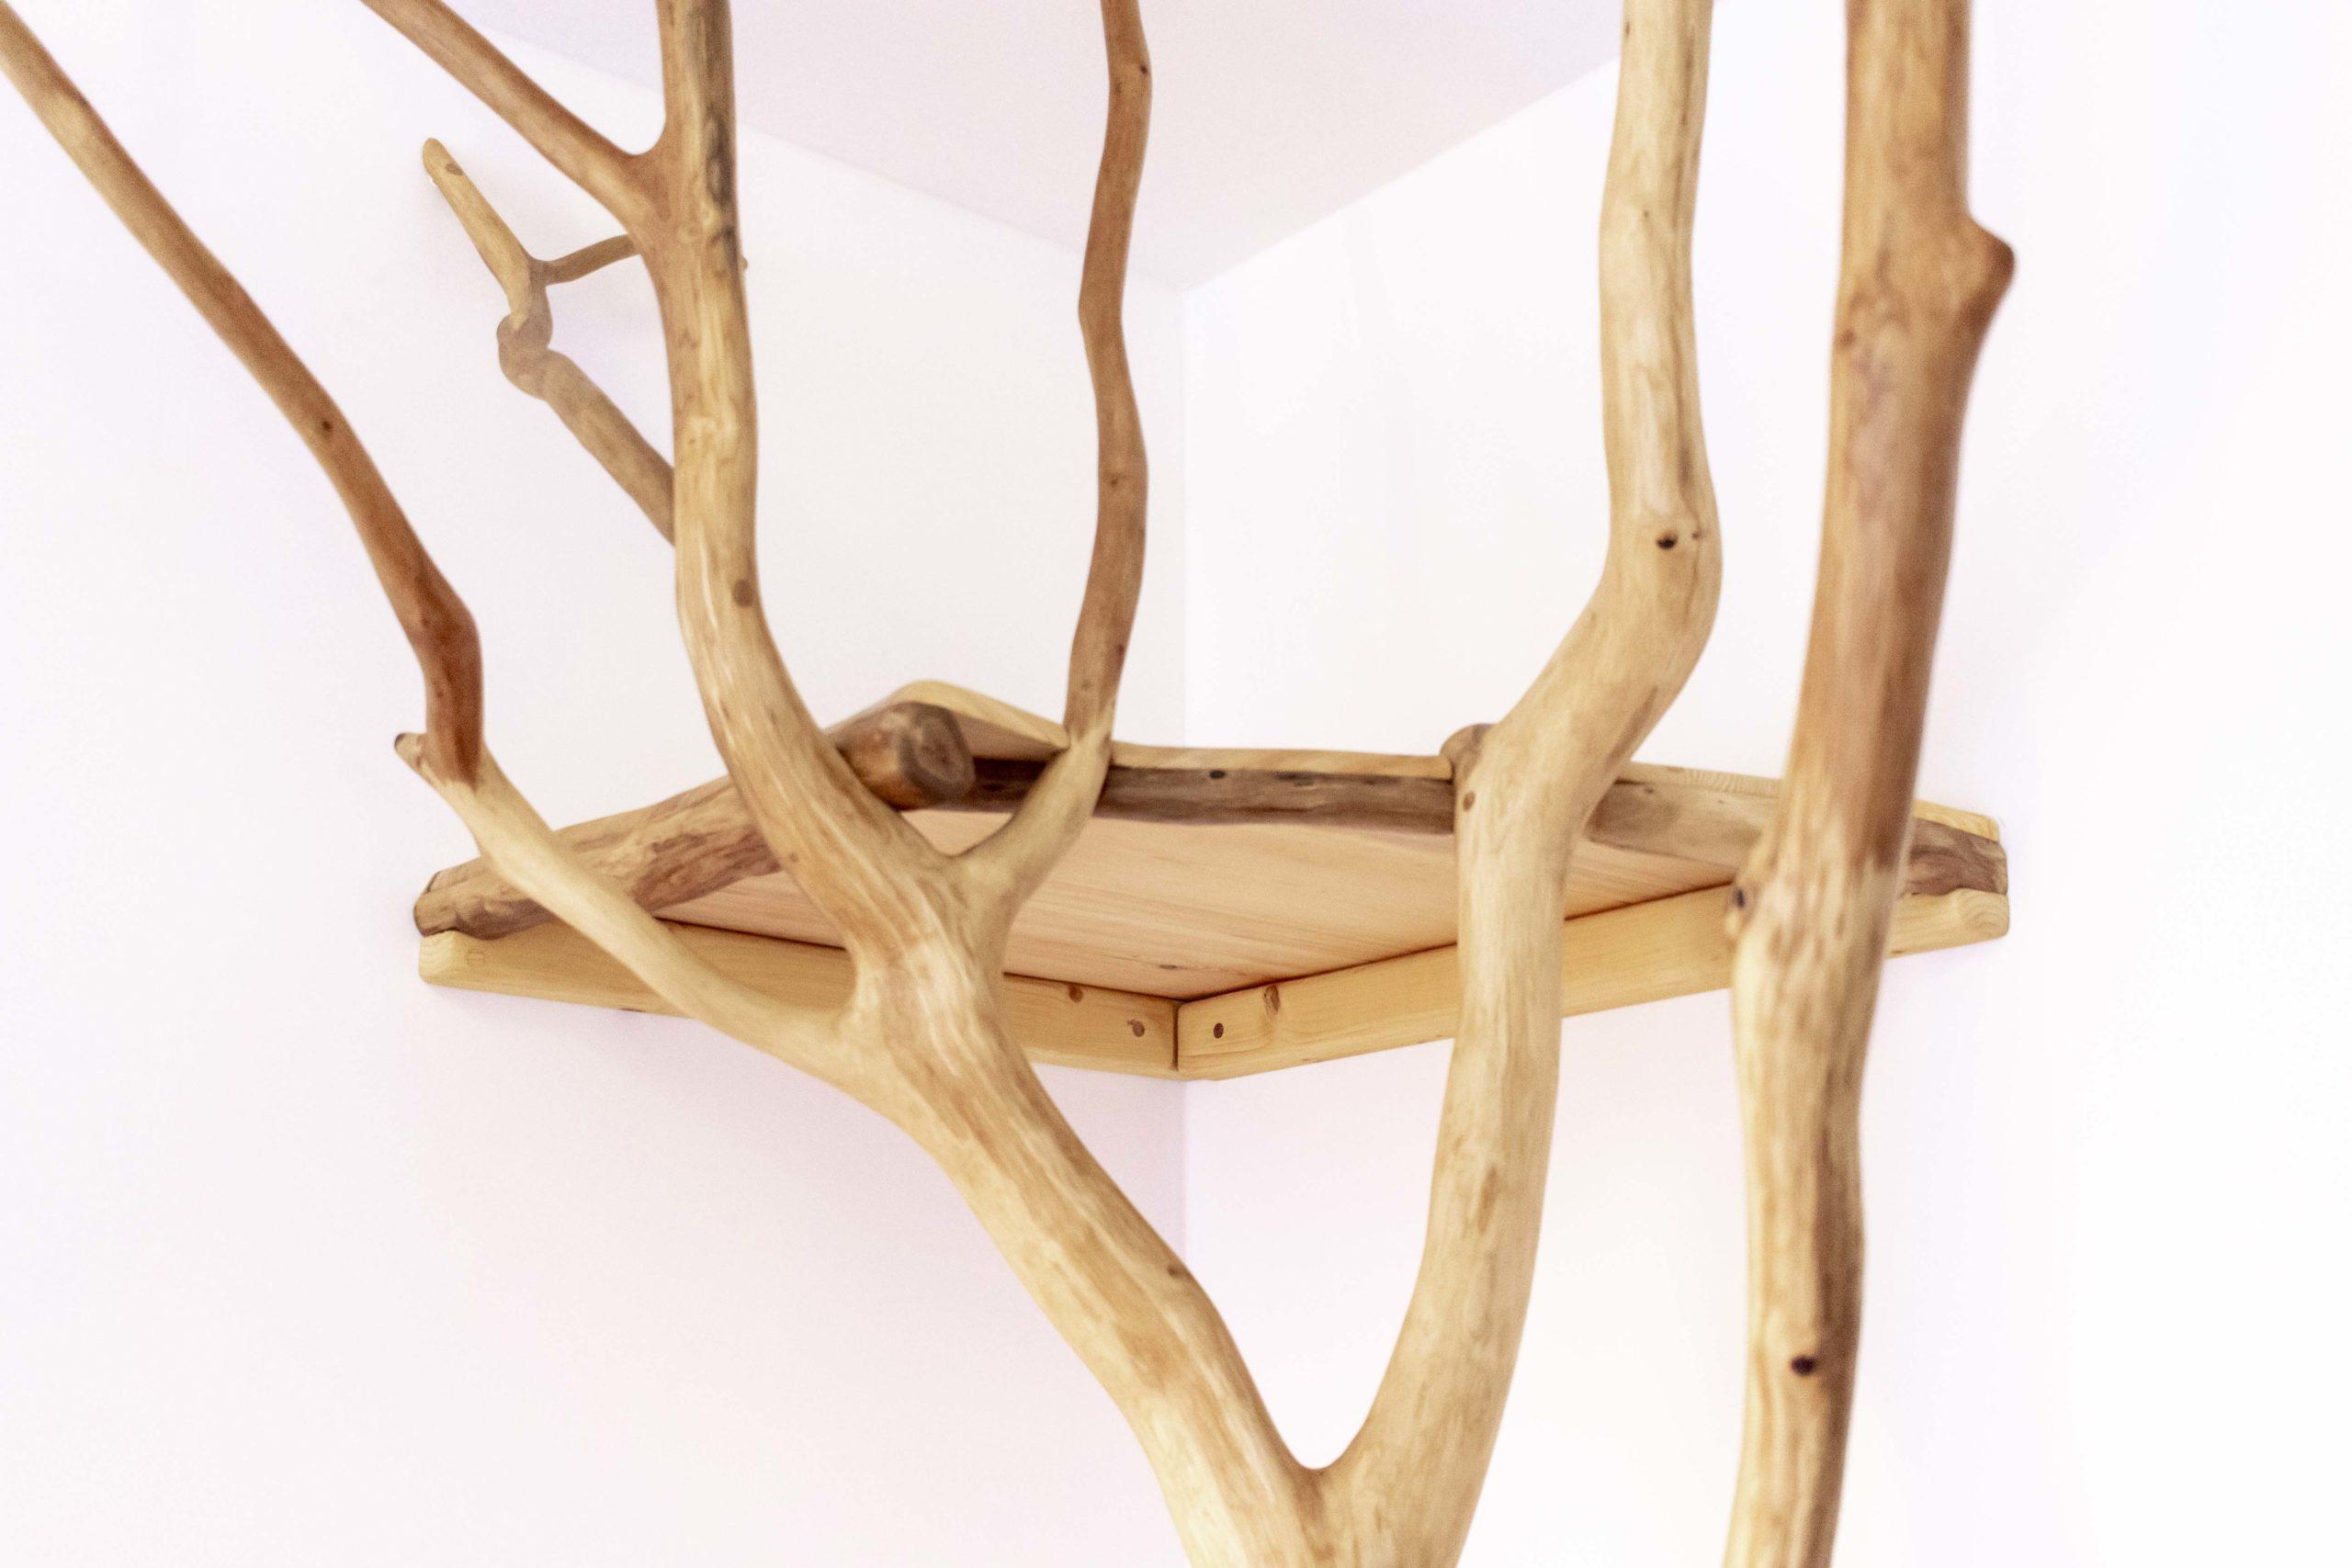 Wildholzkonstruktion mit Hochebene